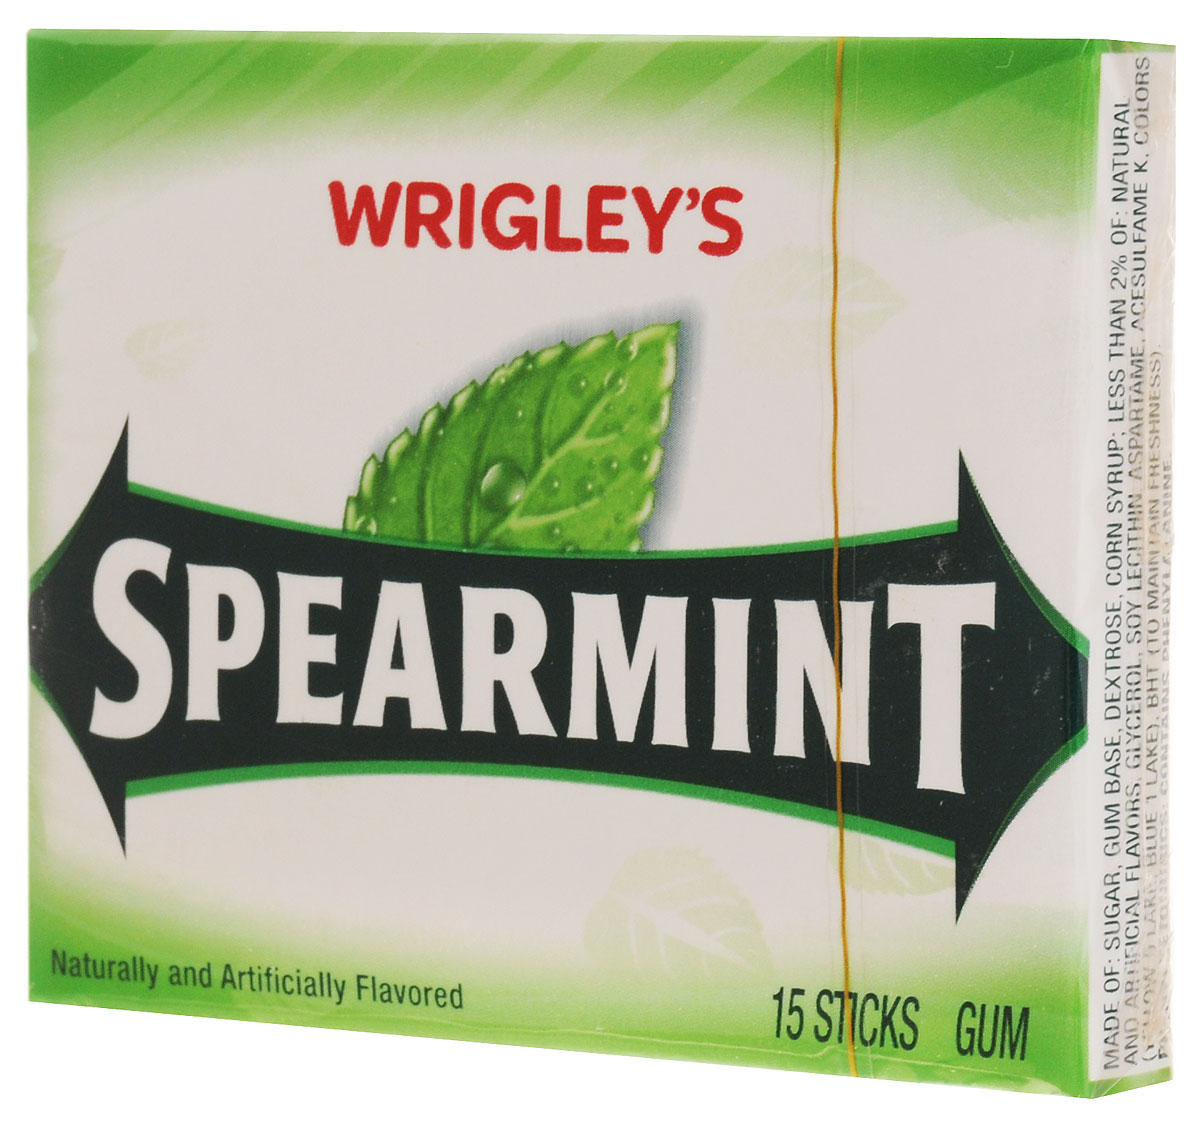 Wrigley's Spearmint жевательная резинка, 40,5 г